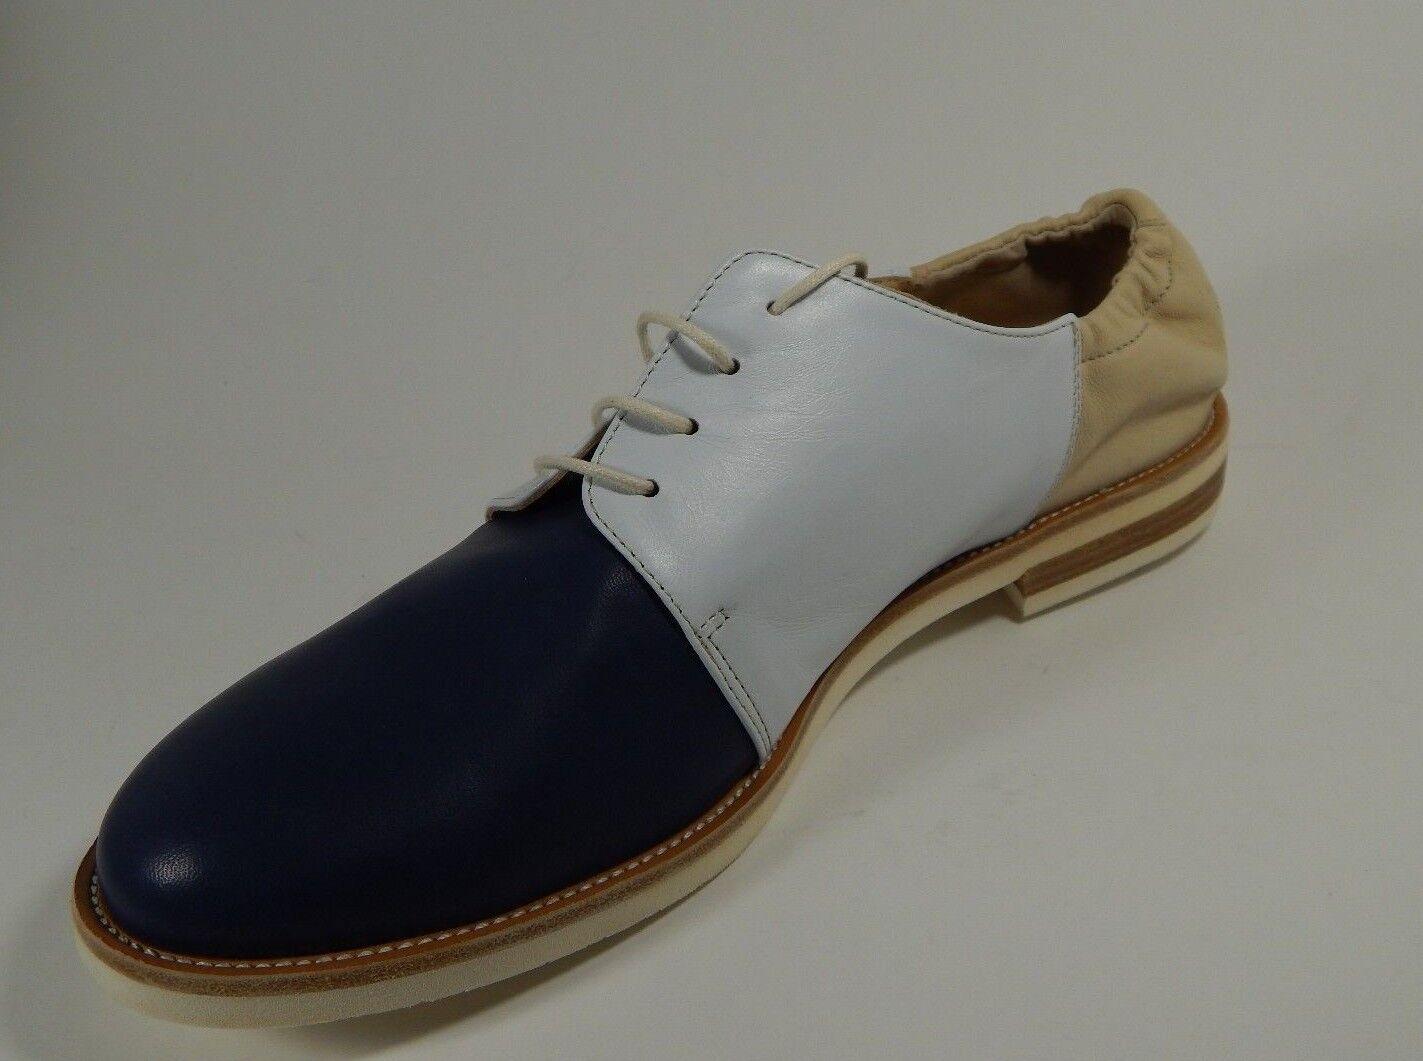 New Amalfi Rangoni TADDEO Derby Leder Lace up Casual Schuhes Leder Derby Blau Weiß Tan 9 M d5ef7d